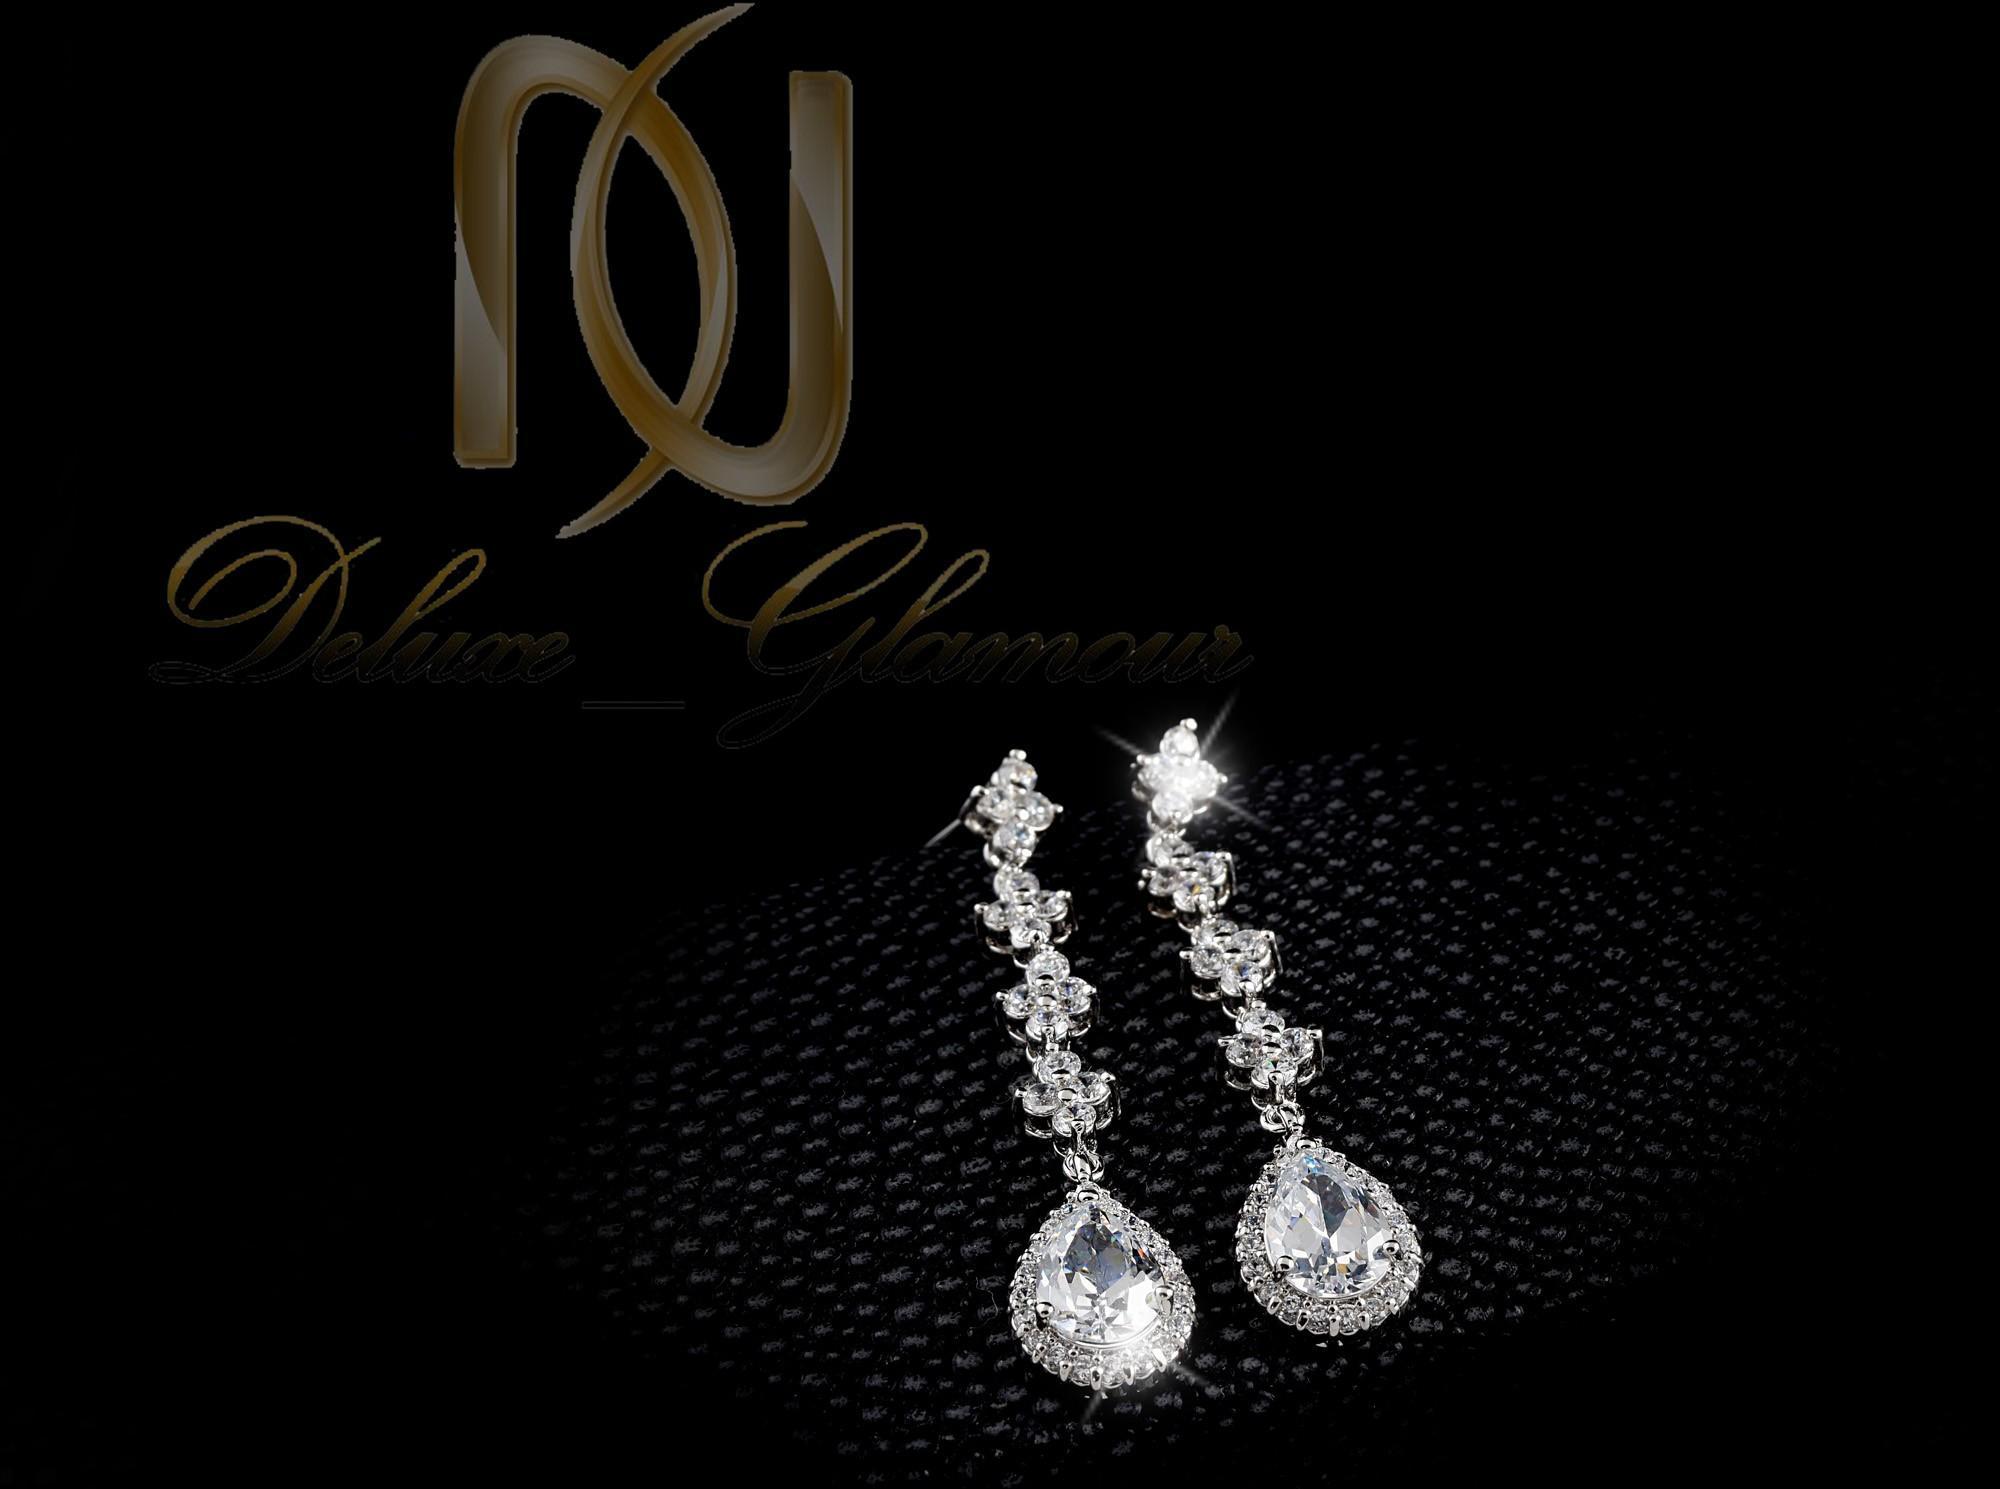 نیم ست جواهري عروس کلیو با کریستالهای سواروسکی Ns-n202 (6)